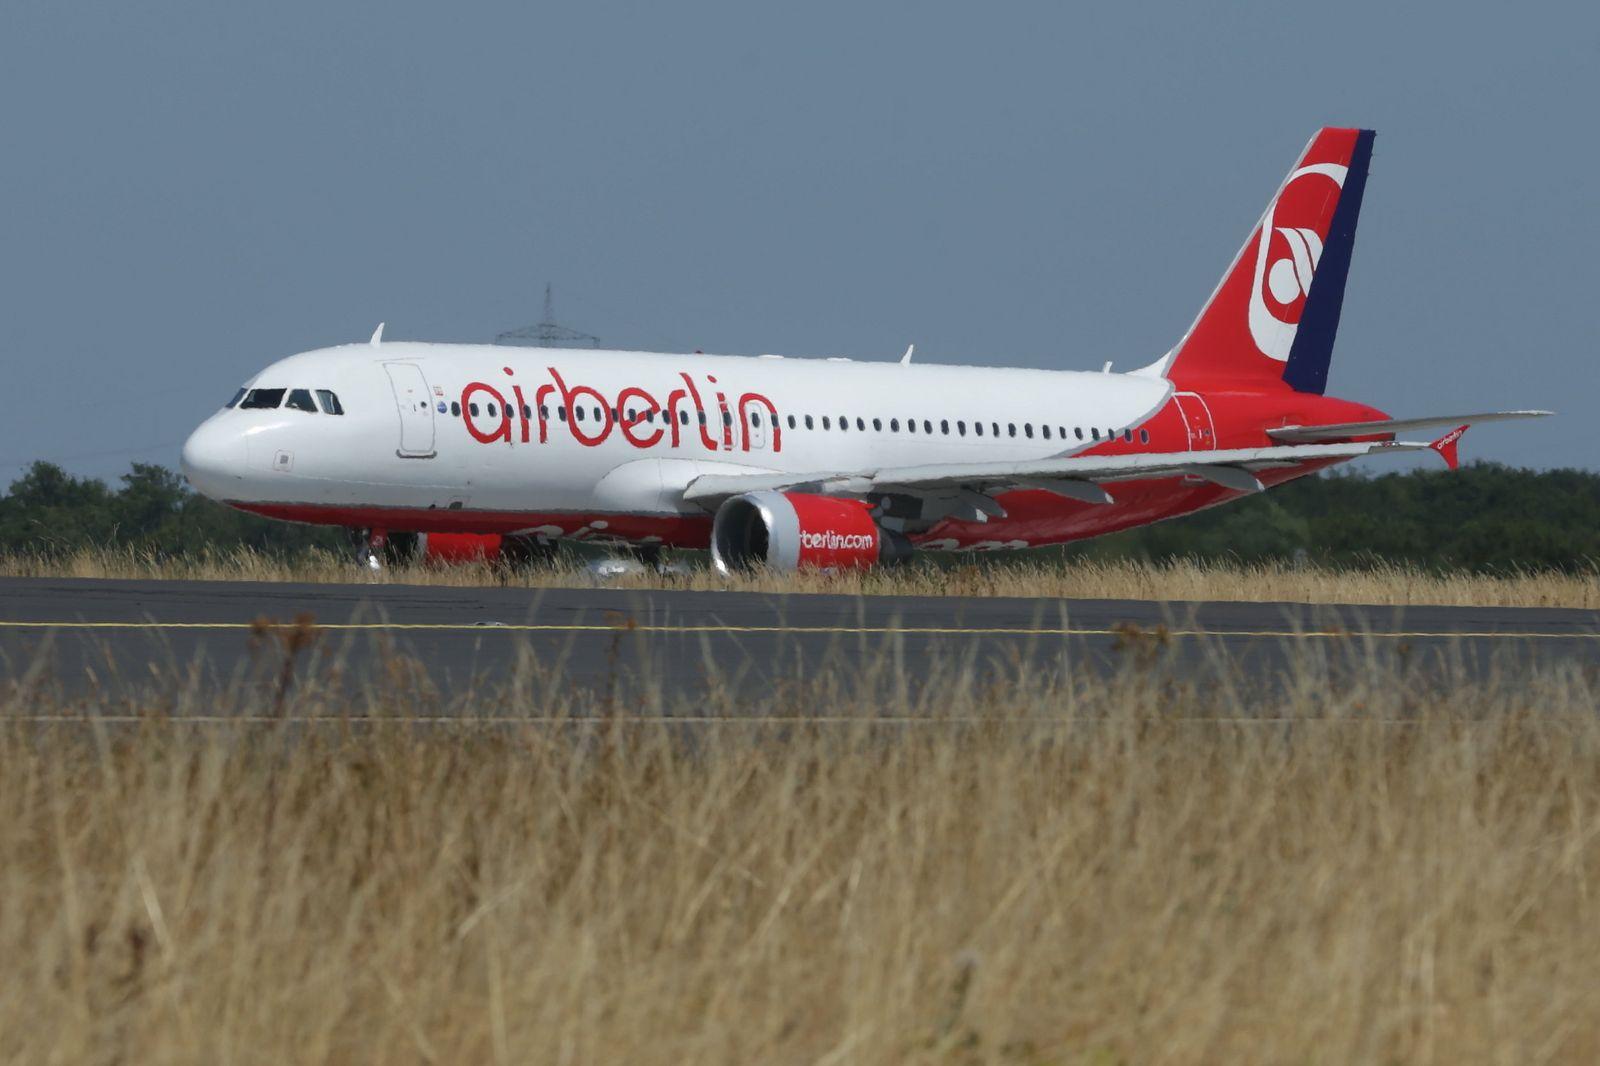 Flugzeug in Air Berlin Livery started in Düsseldorf